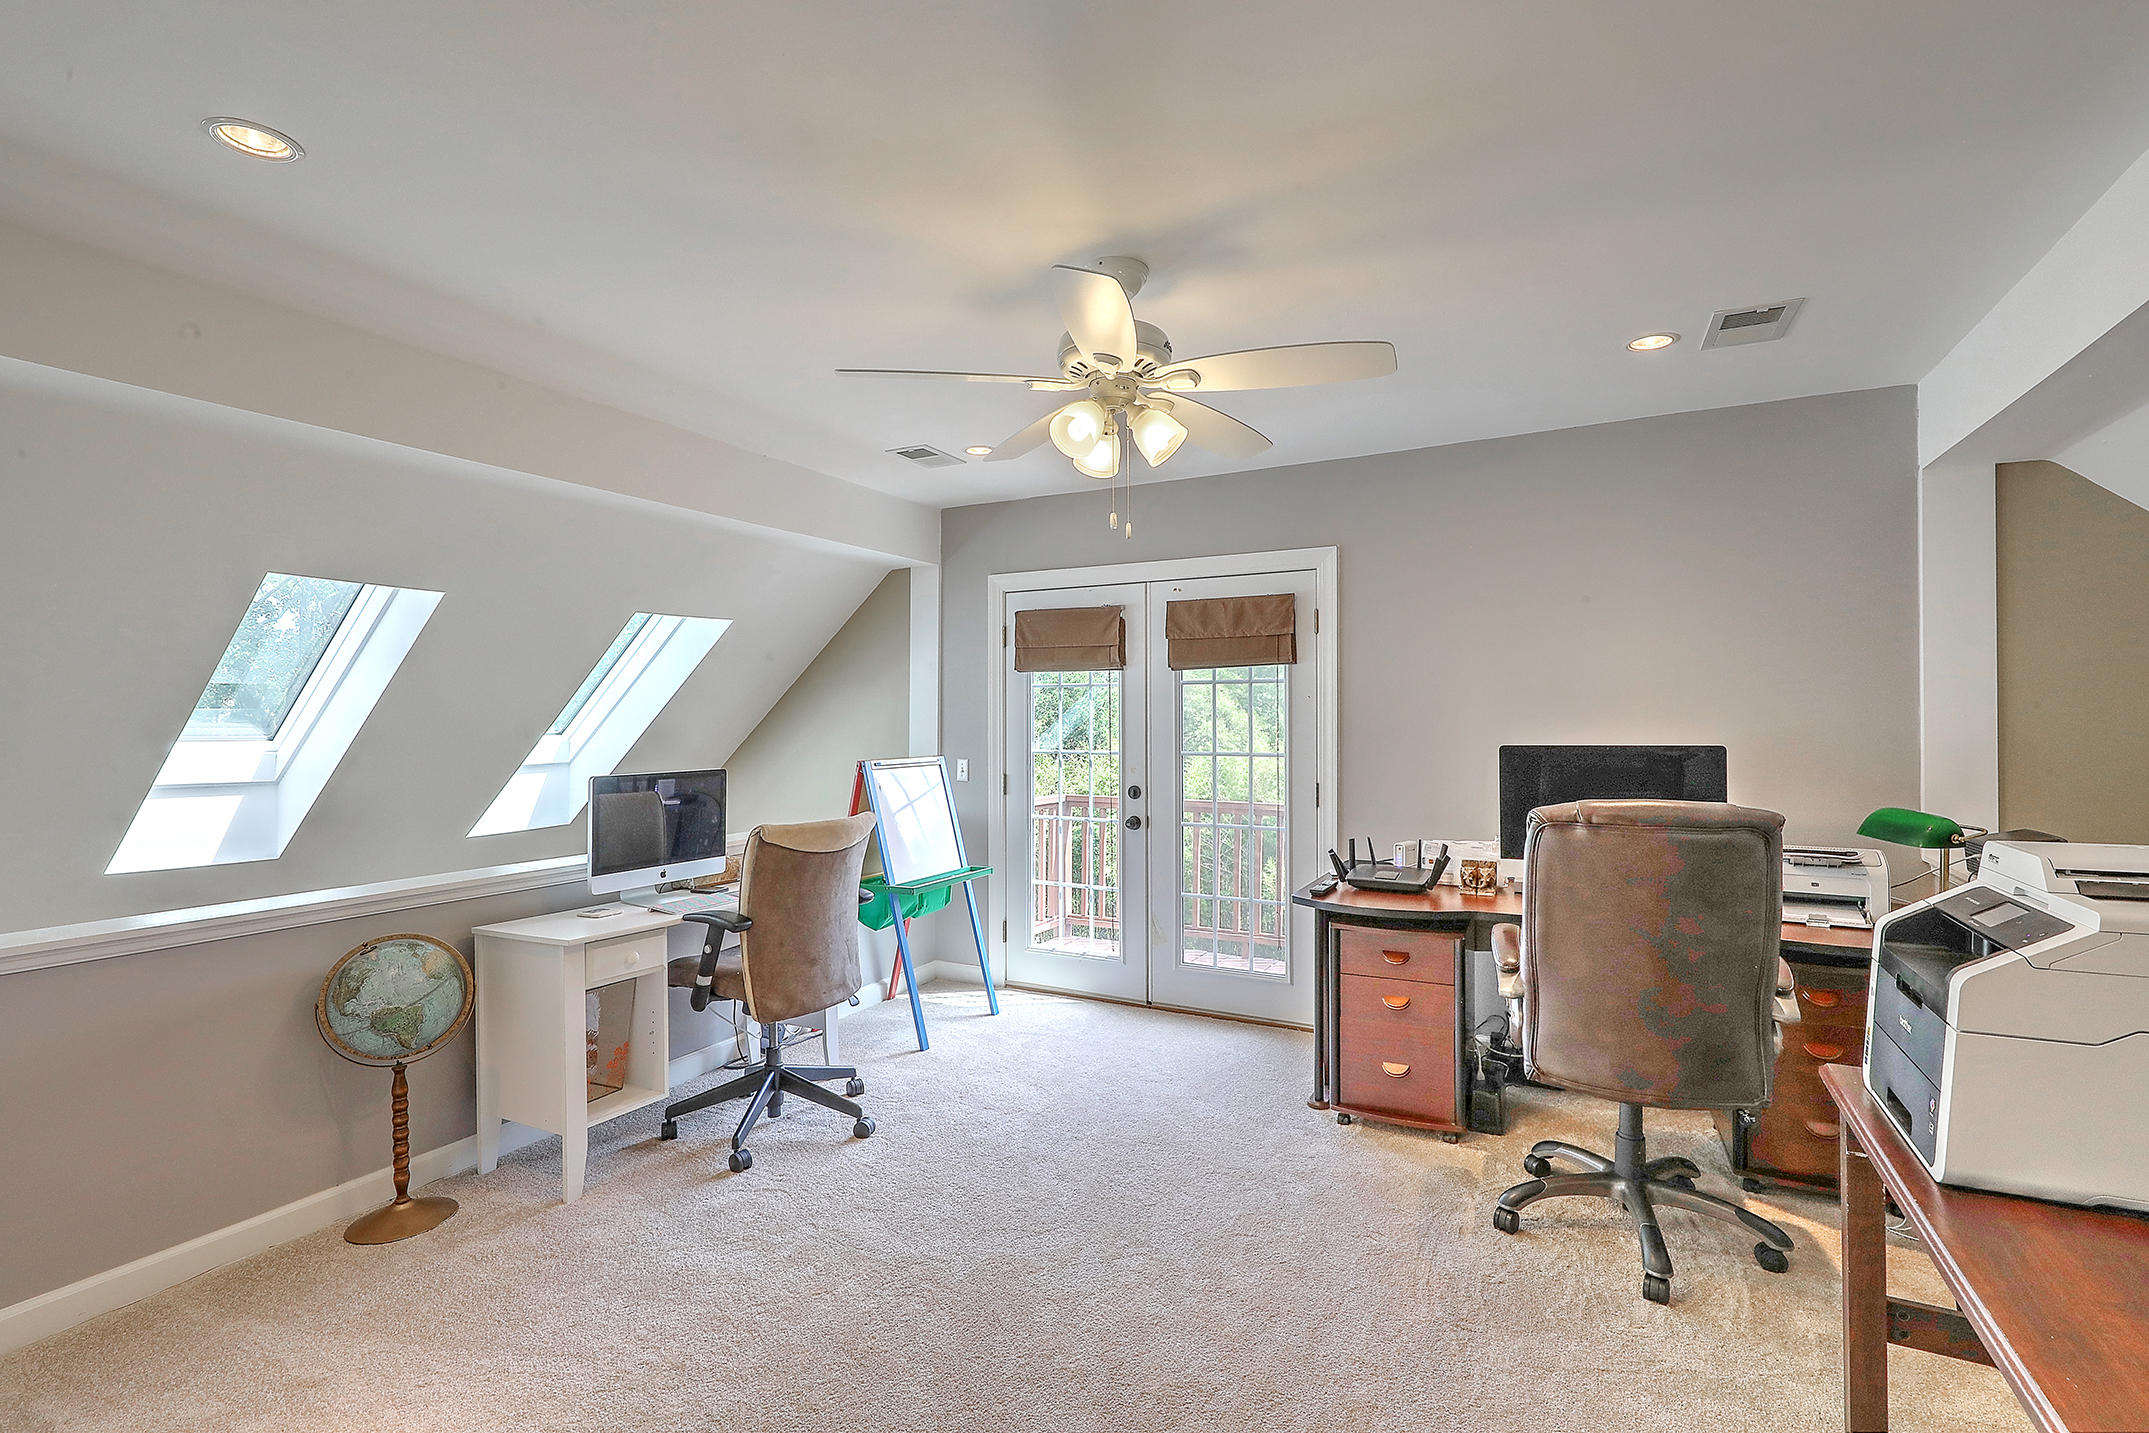 Stono Pointe Homes For Sale - 2660 Burden Creek, Johns Island, SC - 31